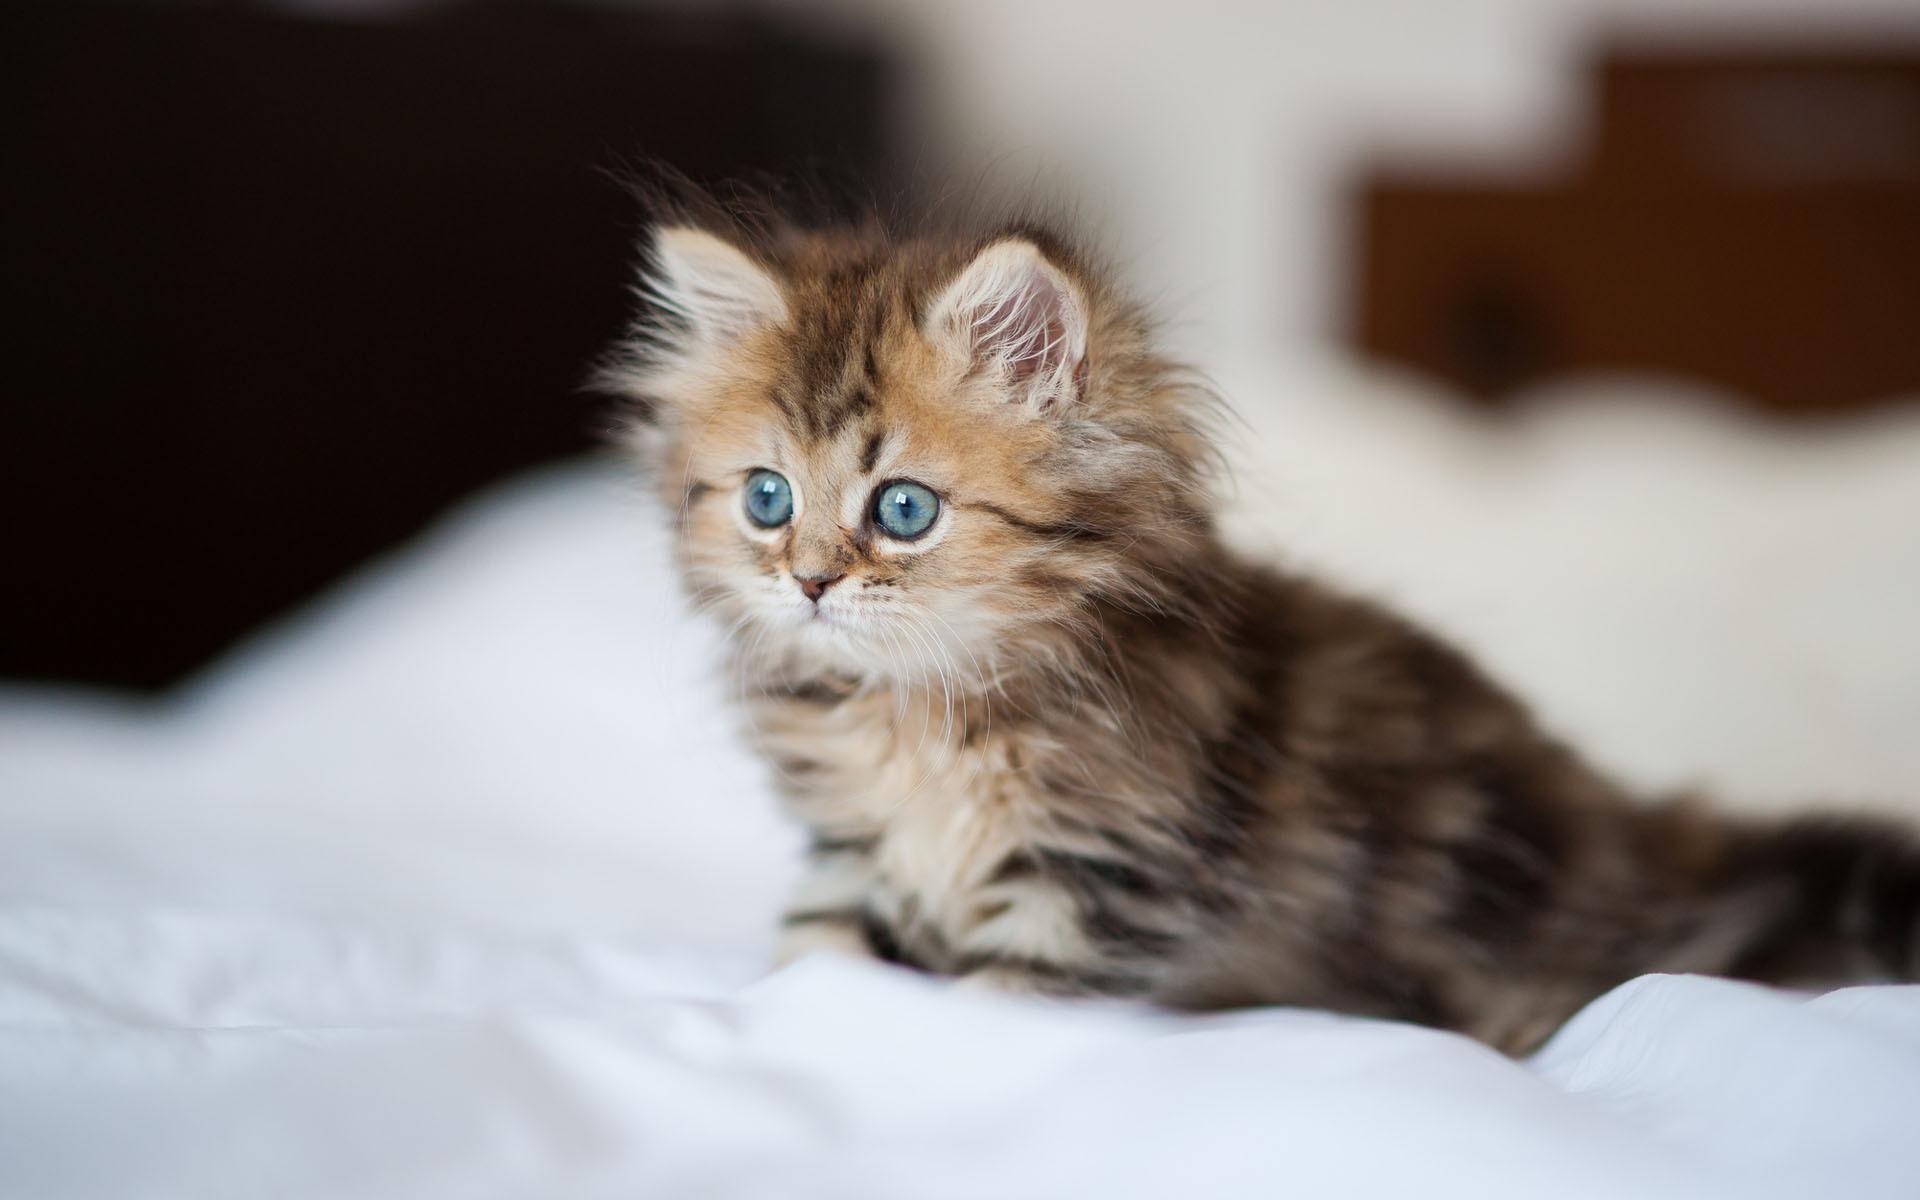 kittens-3-animals-34865316-1920-1200.jpg